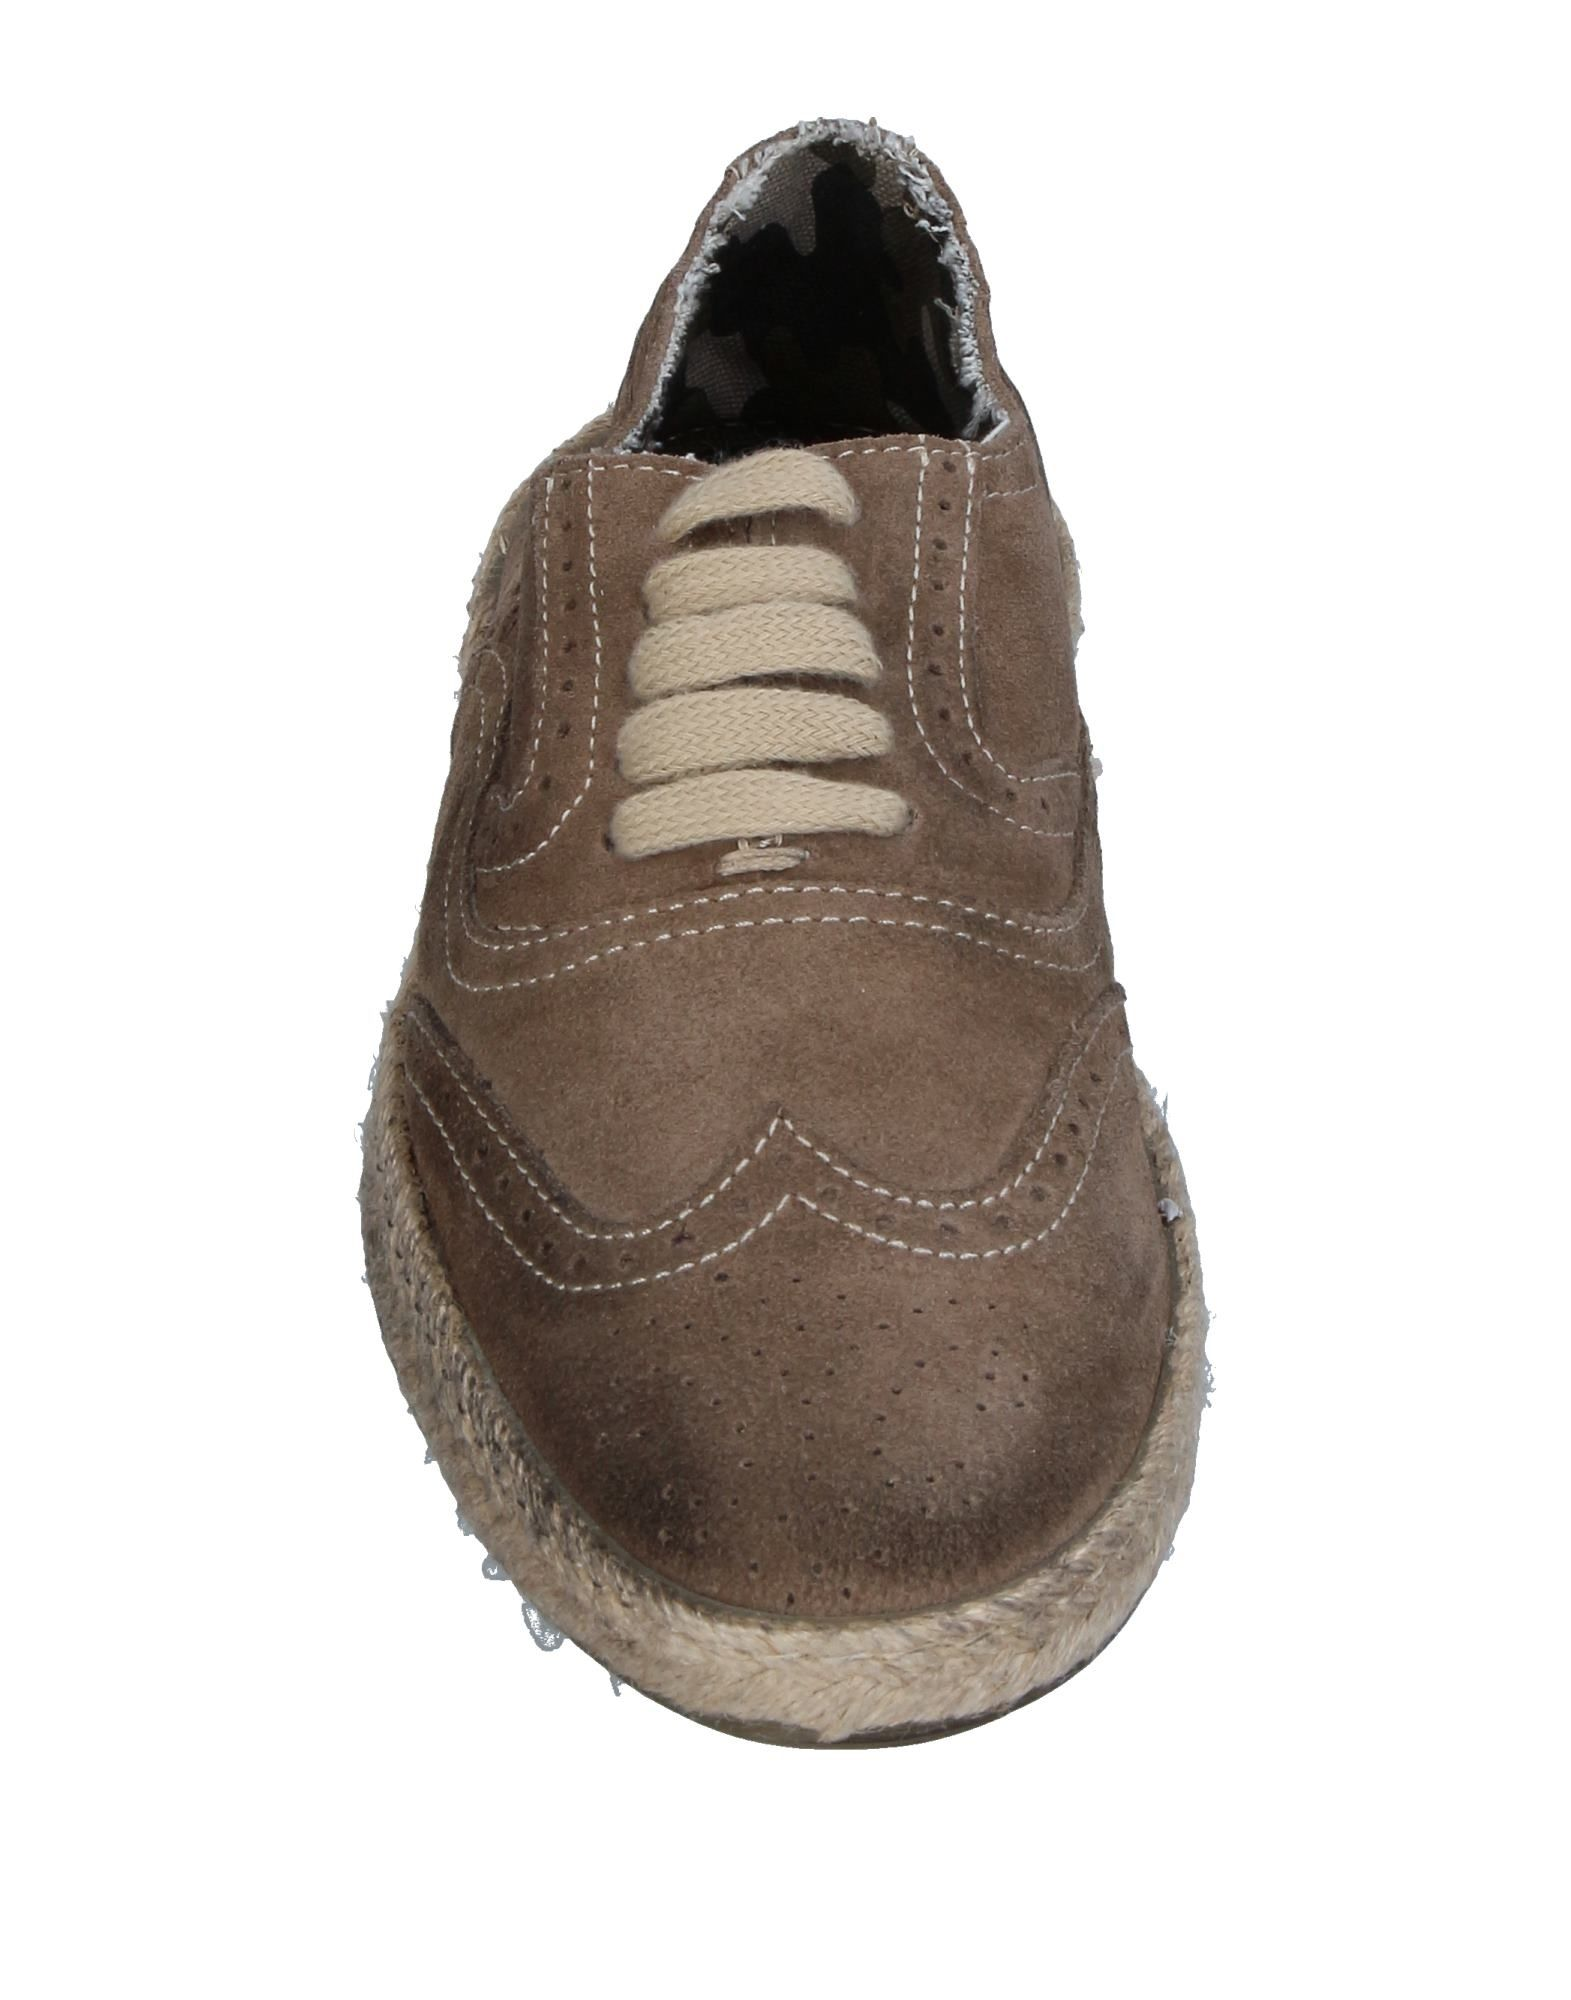 CHAUSSURES - Chaussures à lacetsExibit SWuvx1ChMq